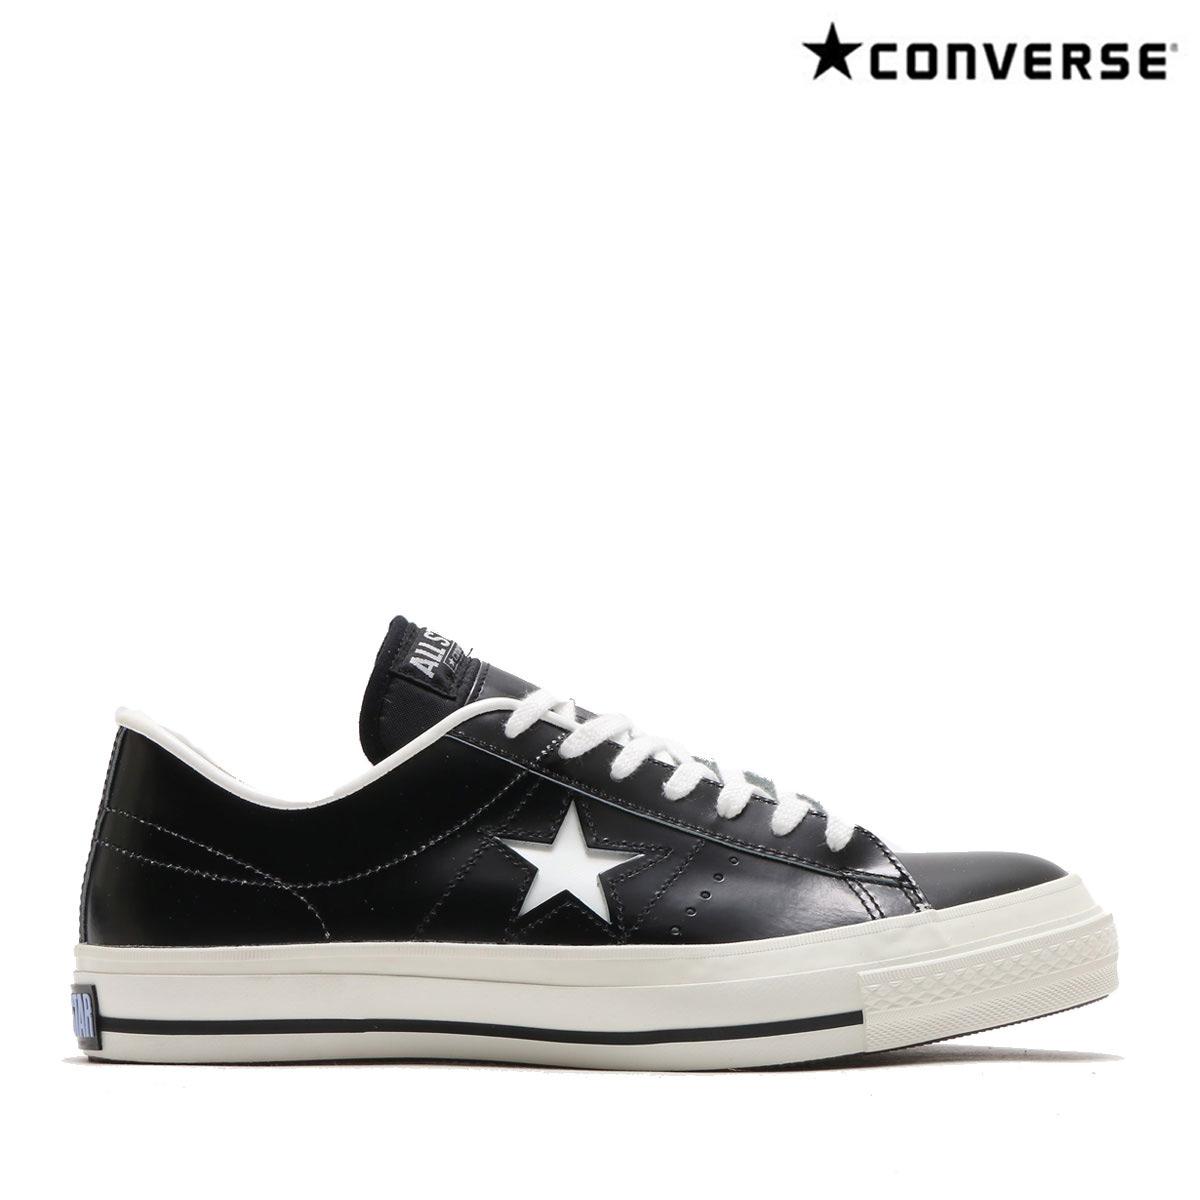 6f748f9b329 Kinetics  CONVERSE ONE STAR J (BLACK WHITE) (Converse one star J ...